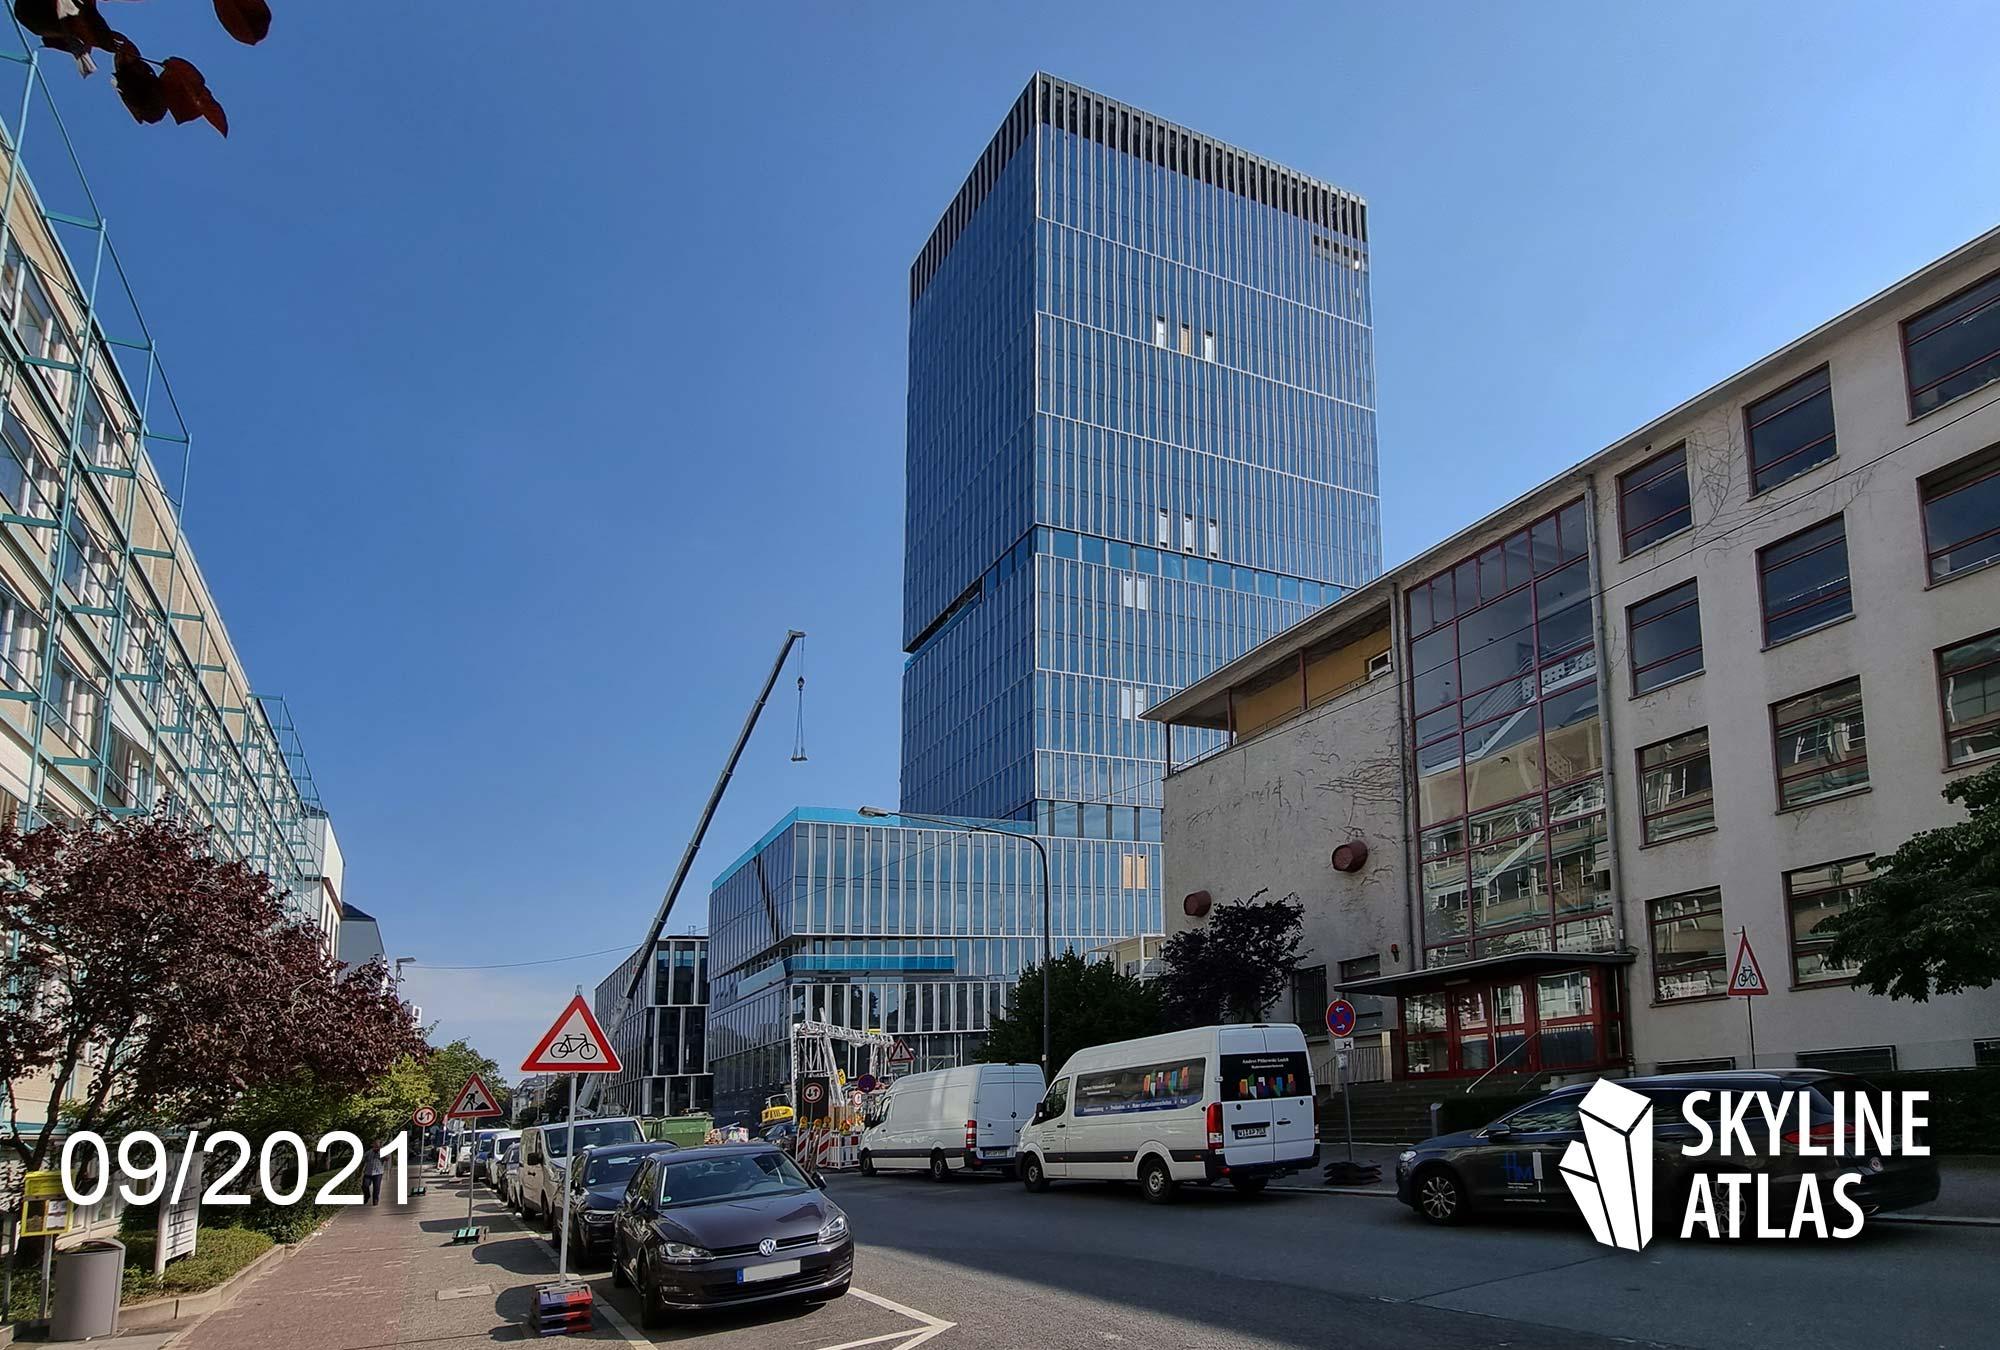 FFM Senckenberg Turm - Dino Turm Frankfurt - Dinosaurier Turm Frankfurt am Main - Baustelle September 2021